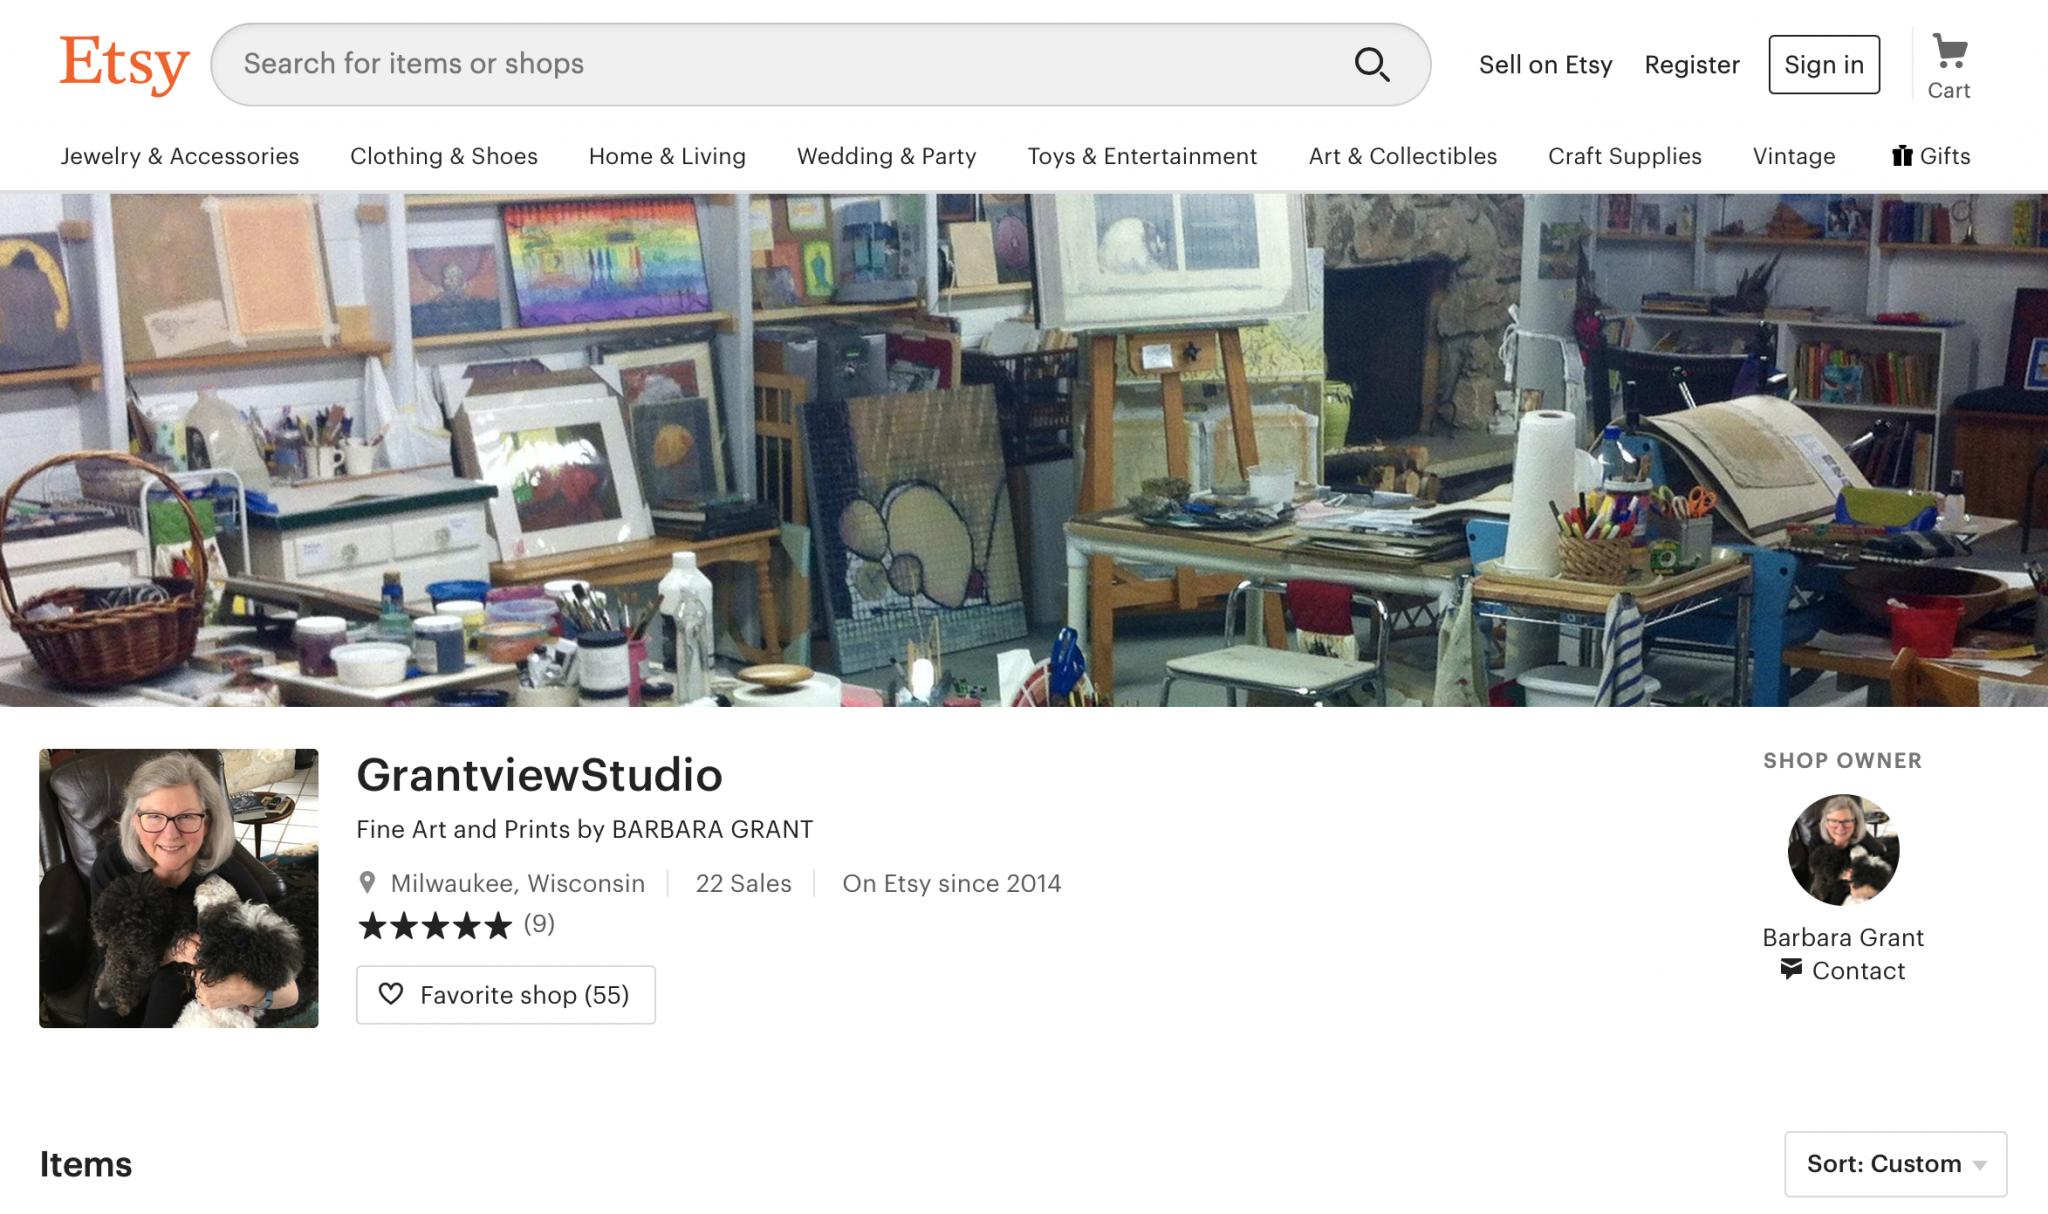 My GrantviewStudio Etsy Shop